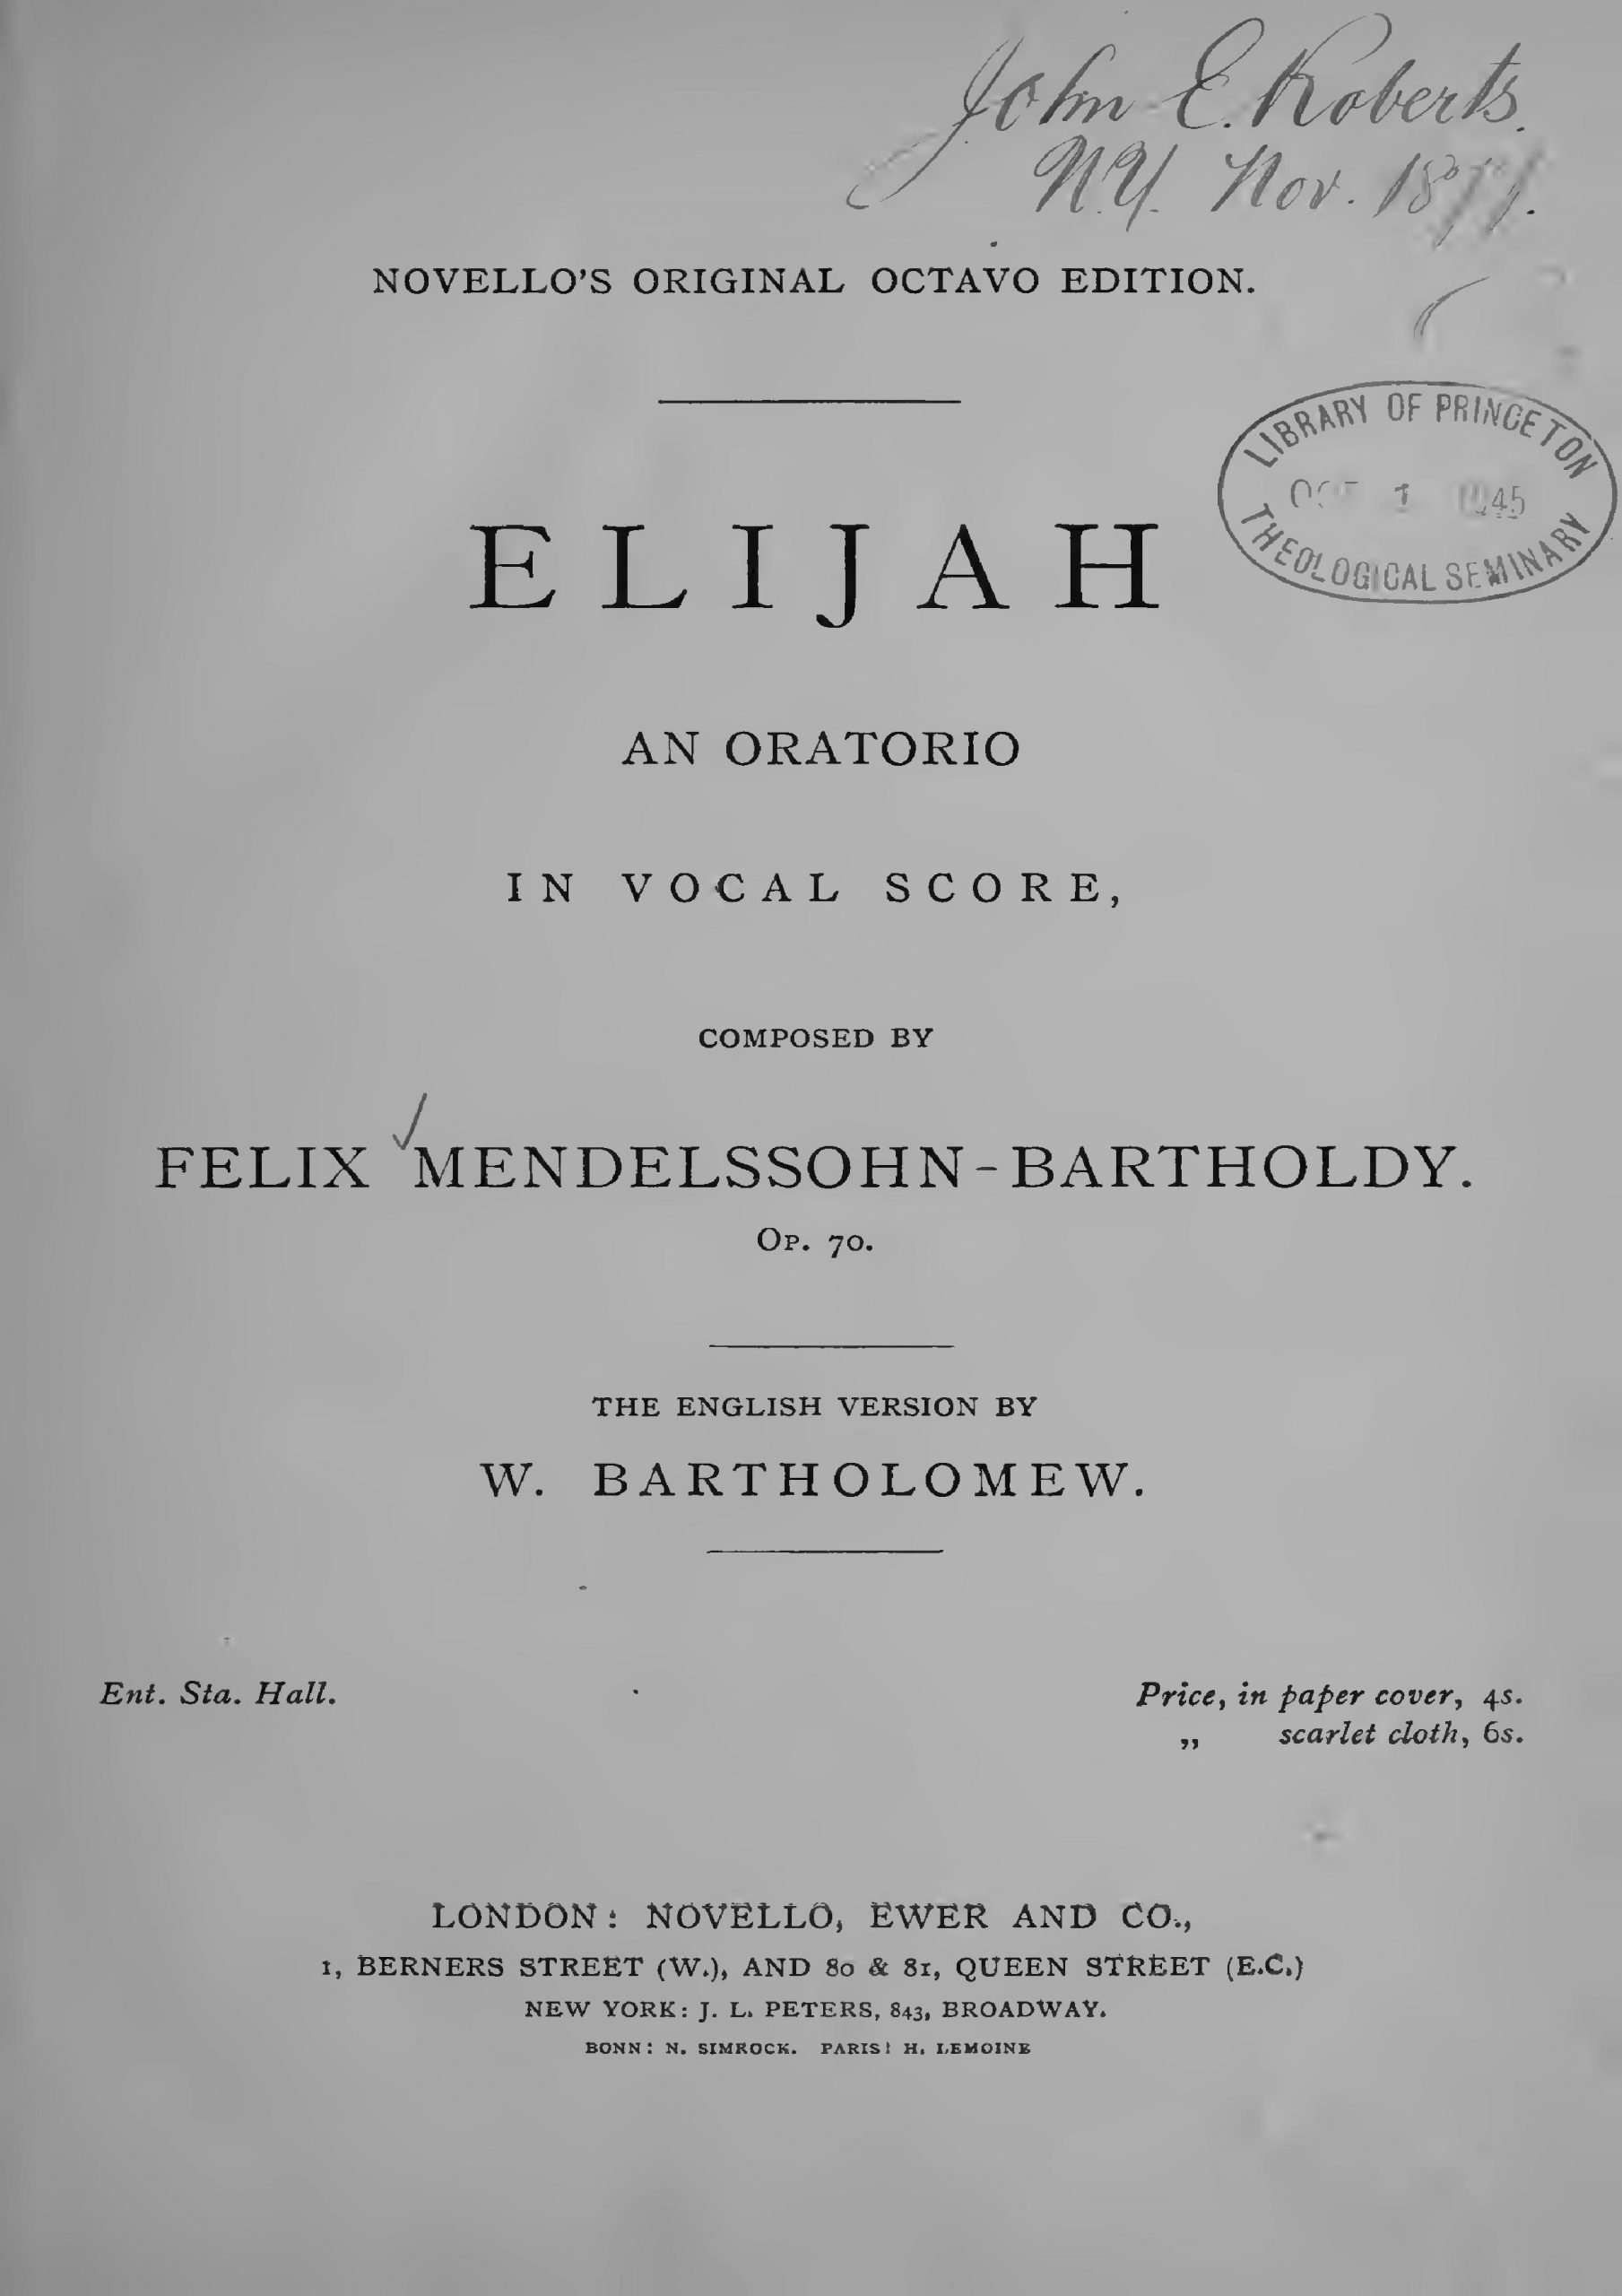 Mendelssohn, Felix - Elijah - vocal score